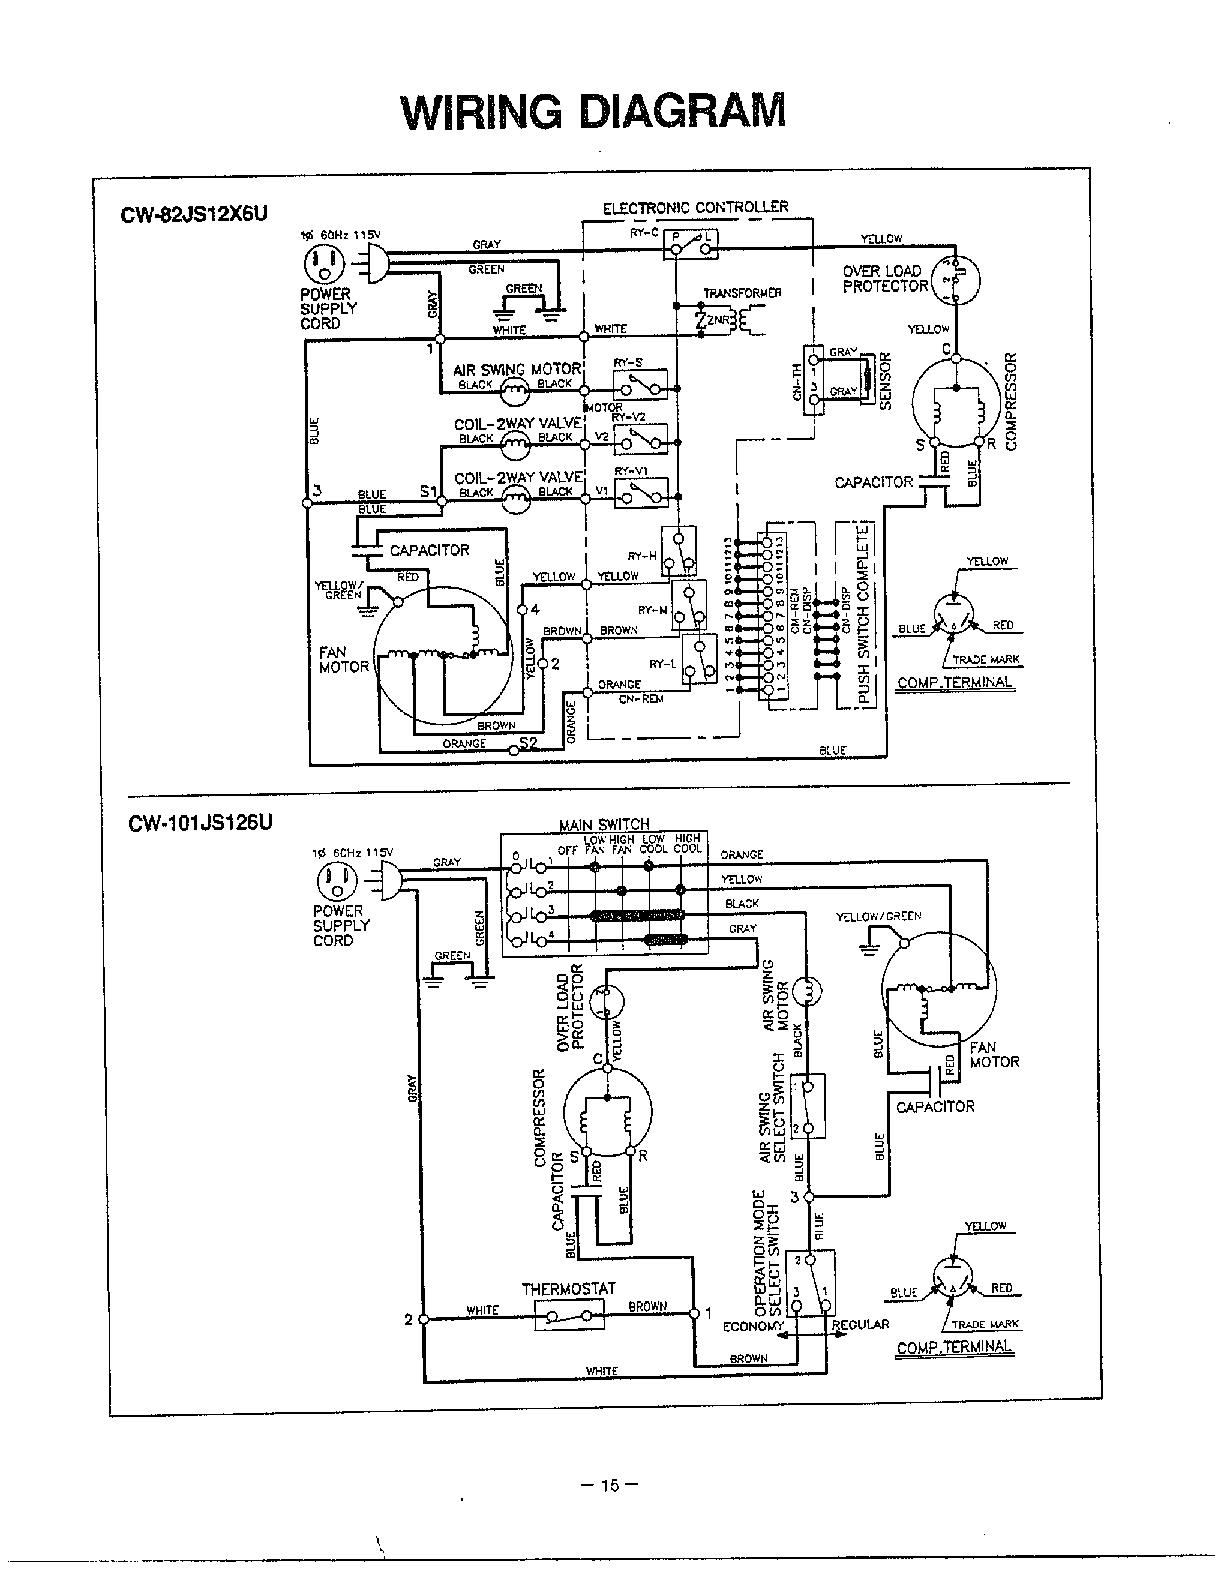 WA001443 00015?resize\\\\\\\\\\\\\\\=665%2C861 panasonic cq rx100u wiring diagram & panasonic cq rx100u wiring panasonic cq-rx100u wiring harness at gsmx.co